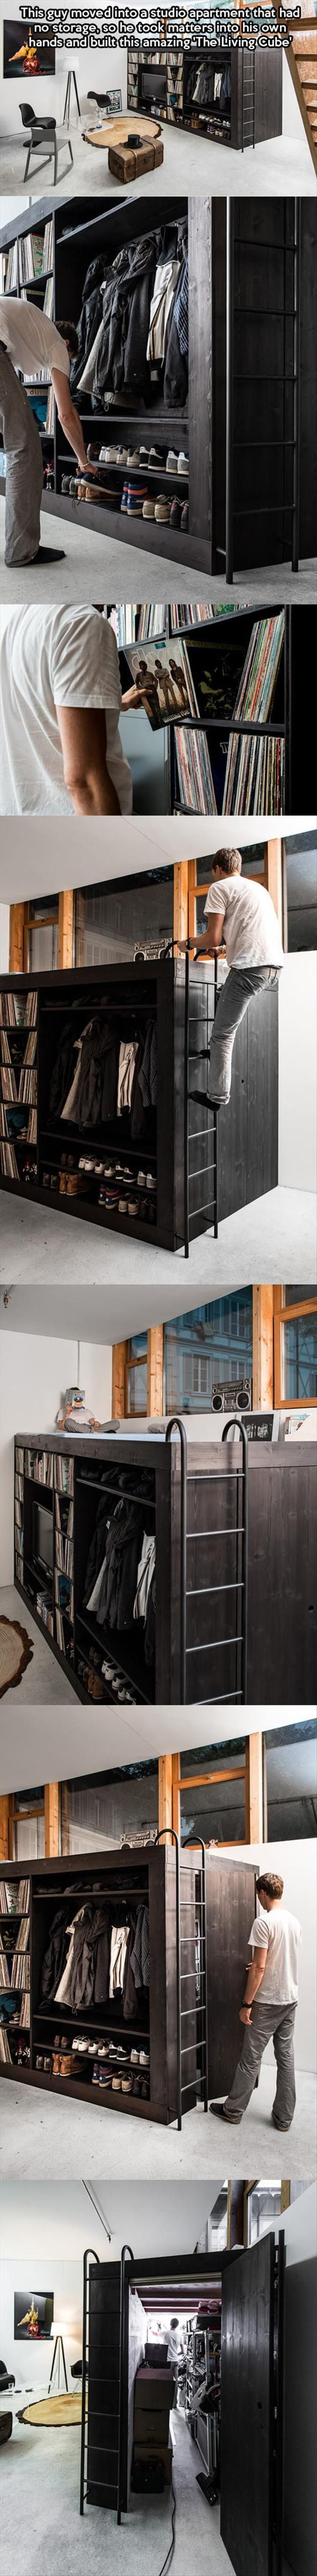 ... , Apartments Ideas, Diy Closet, Studio Apartment, Closet Diy Ideas